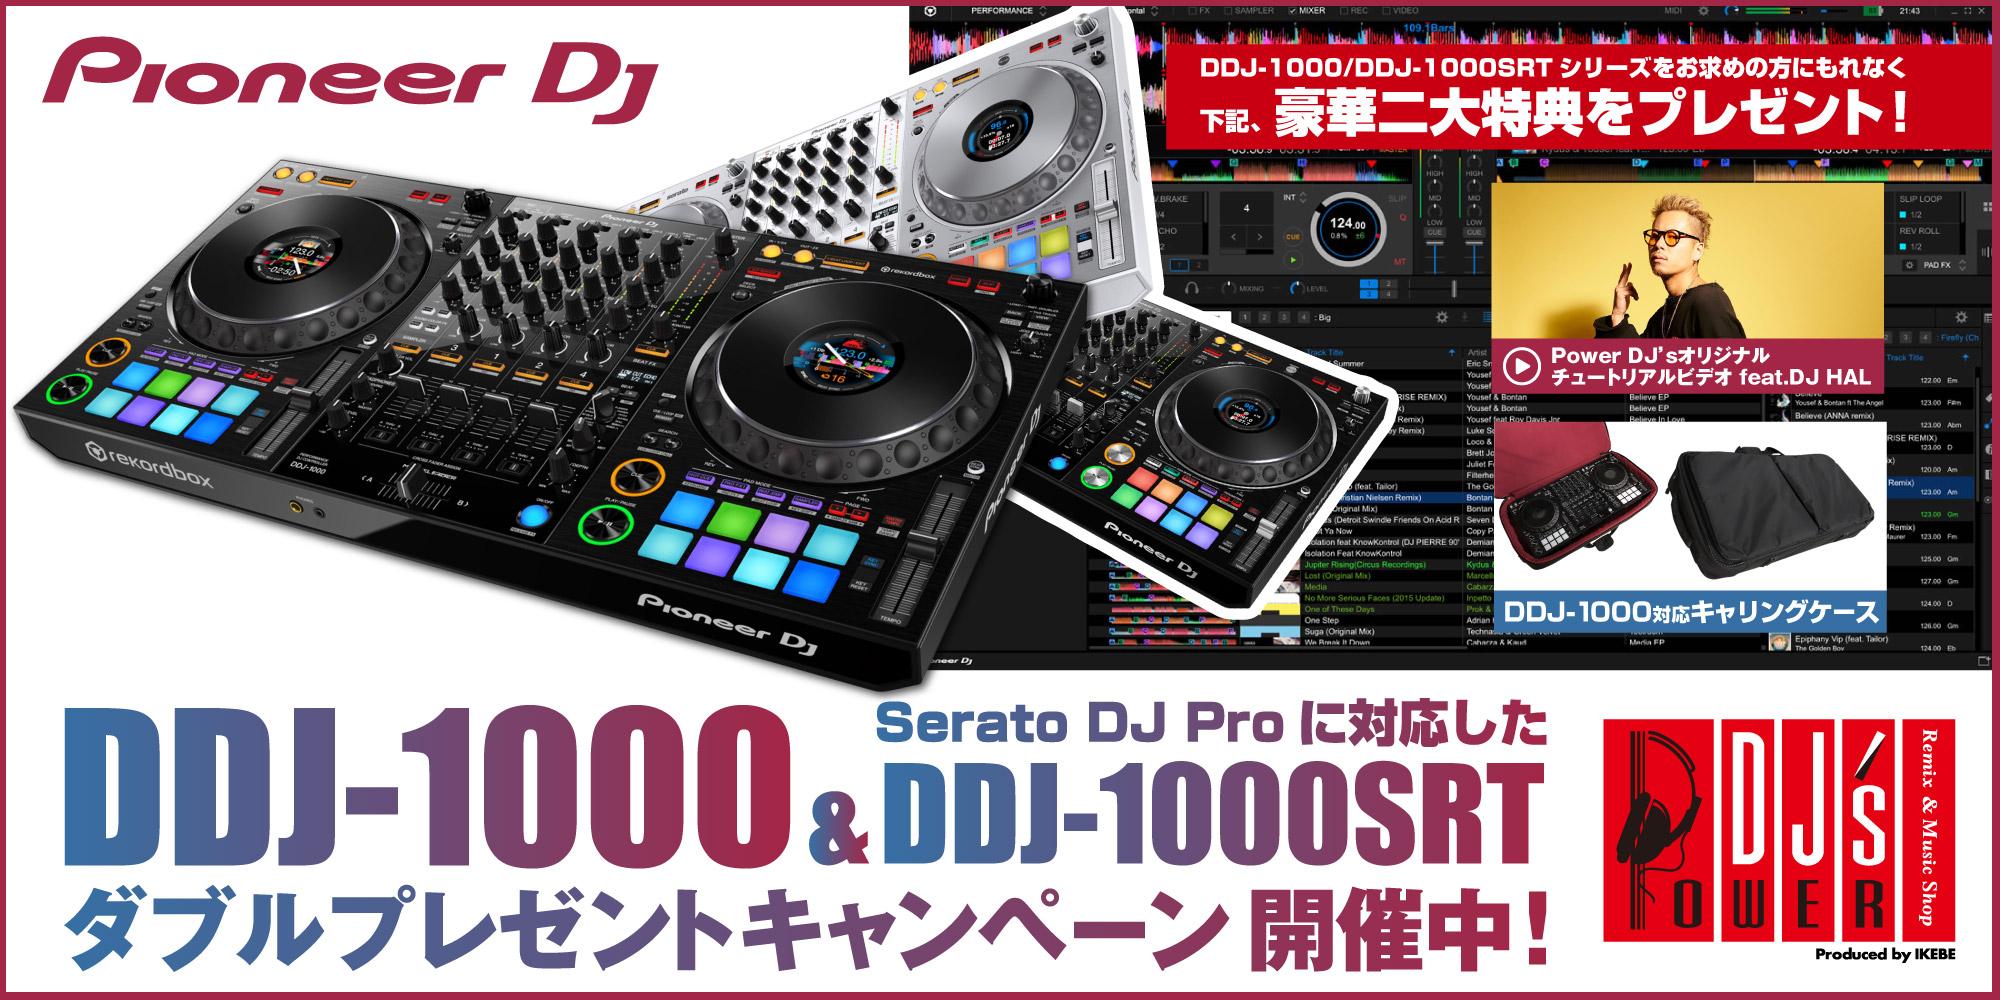 DDJ-1000 & DDJ-1000SRT ダブルプレゼントキャンペーン開催中!